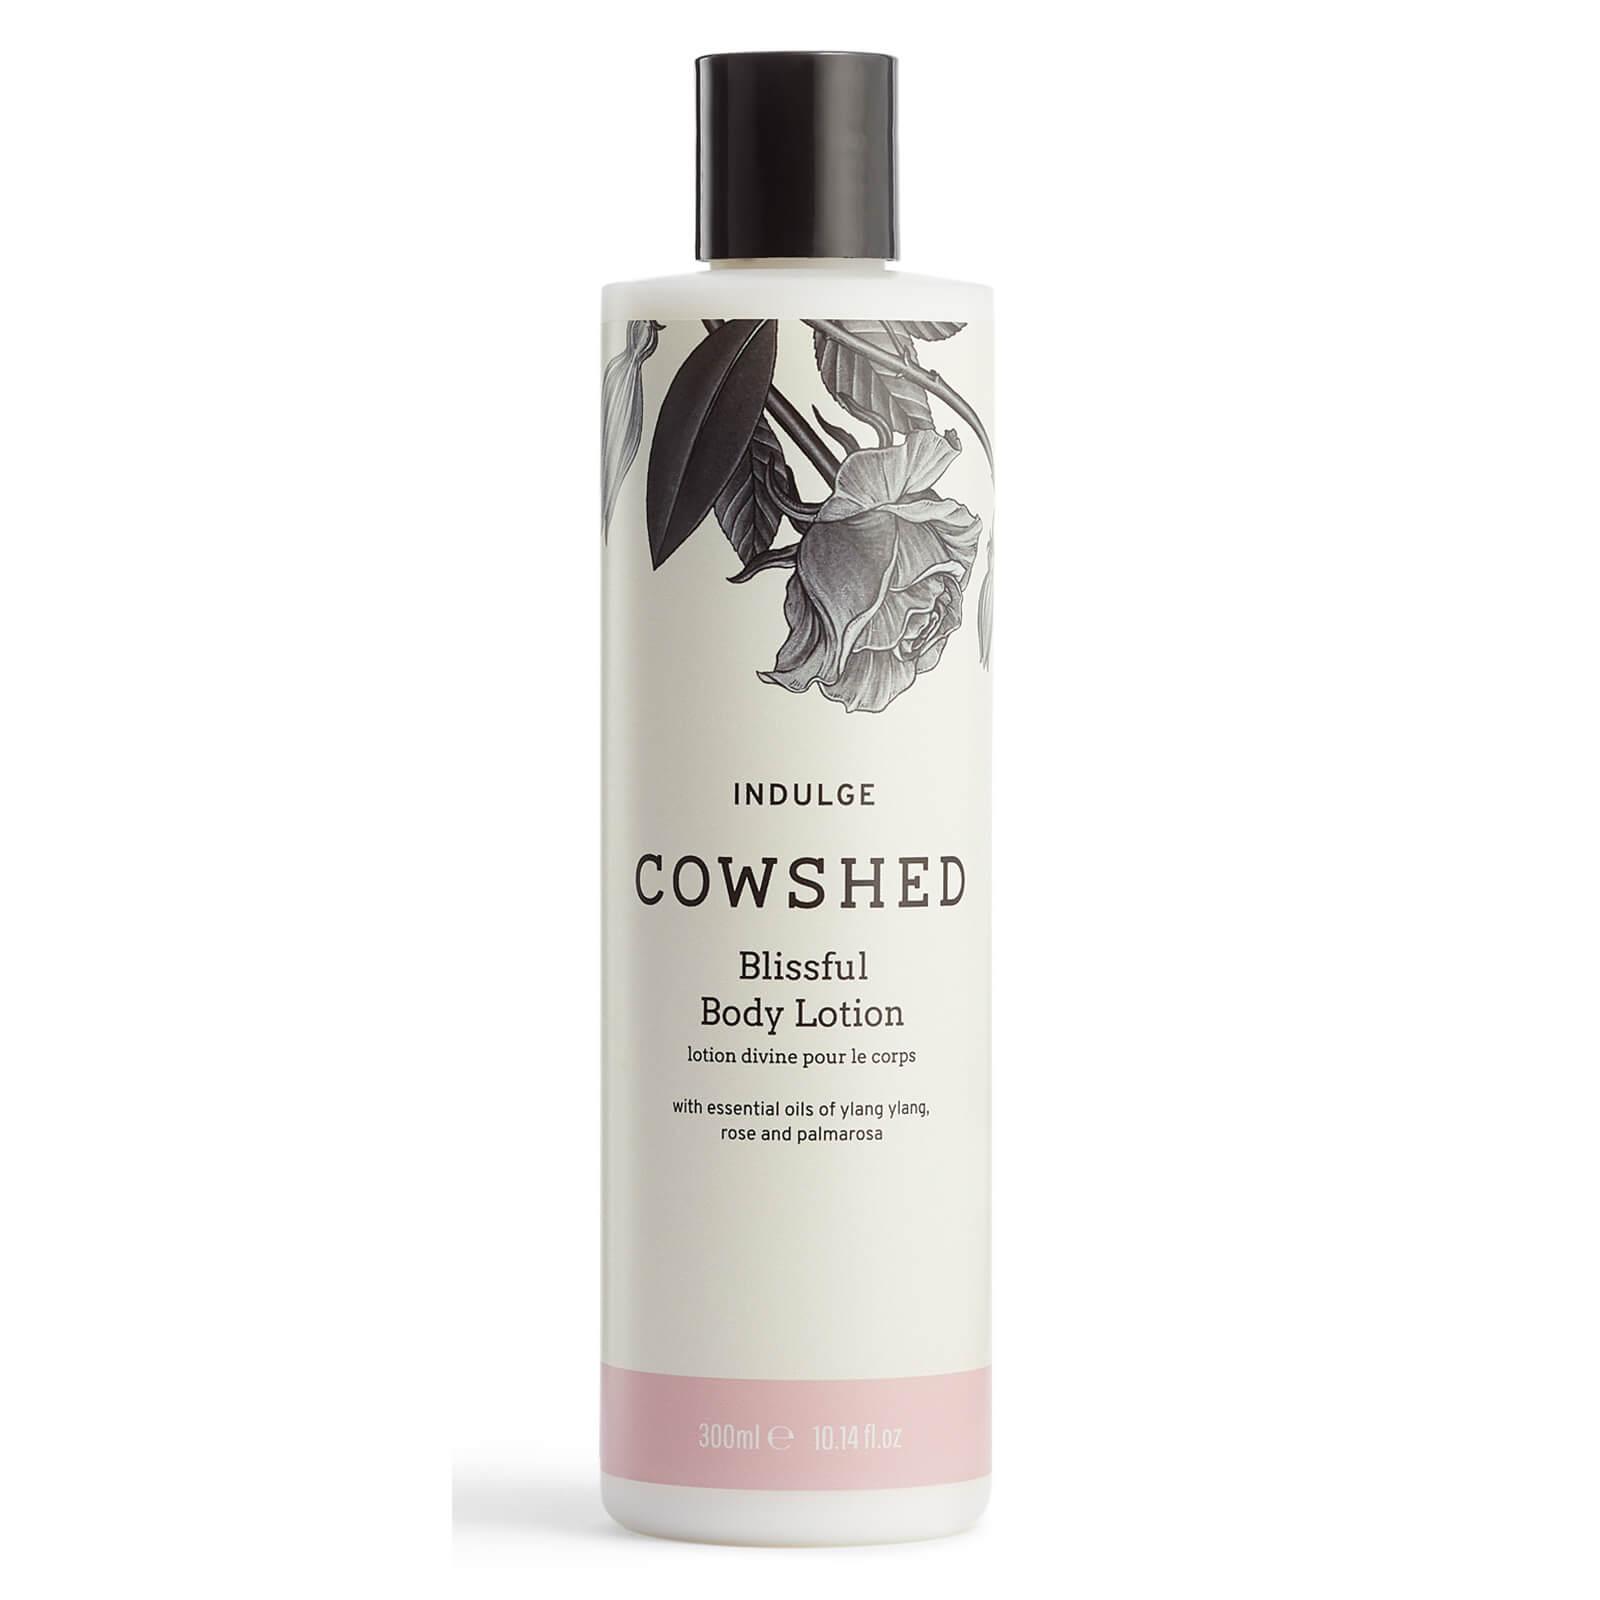 Купить Cowshed INDULGE Blissful Body Lotion 300ml